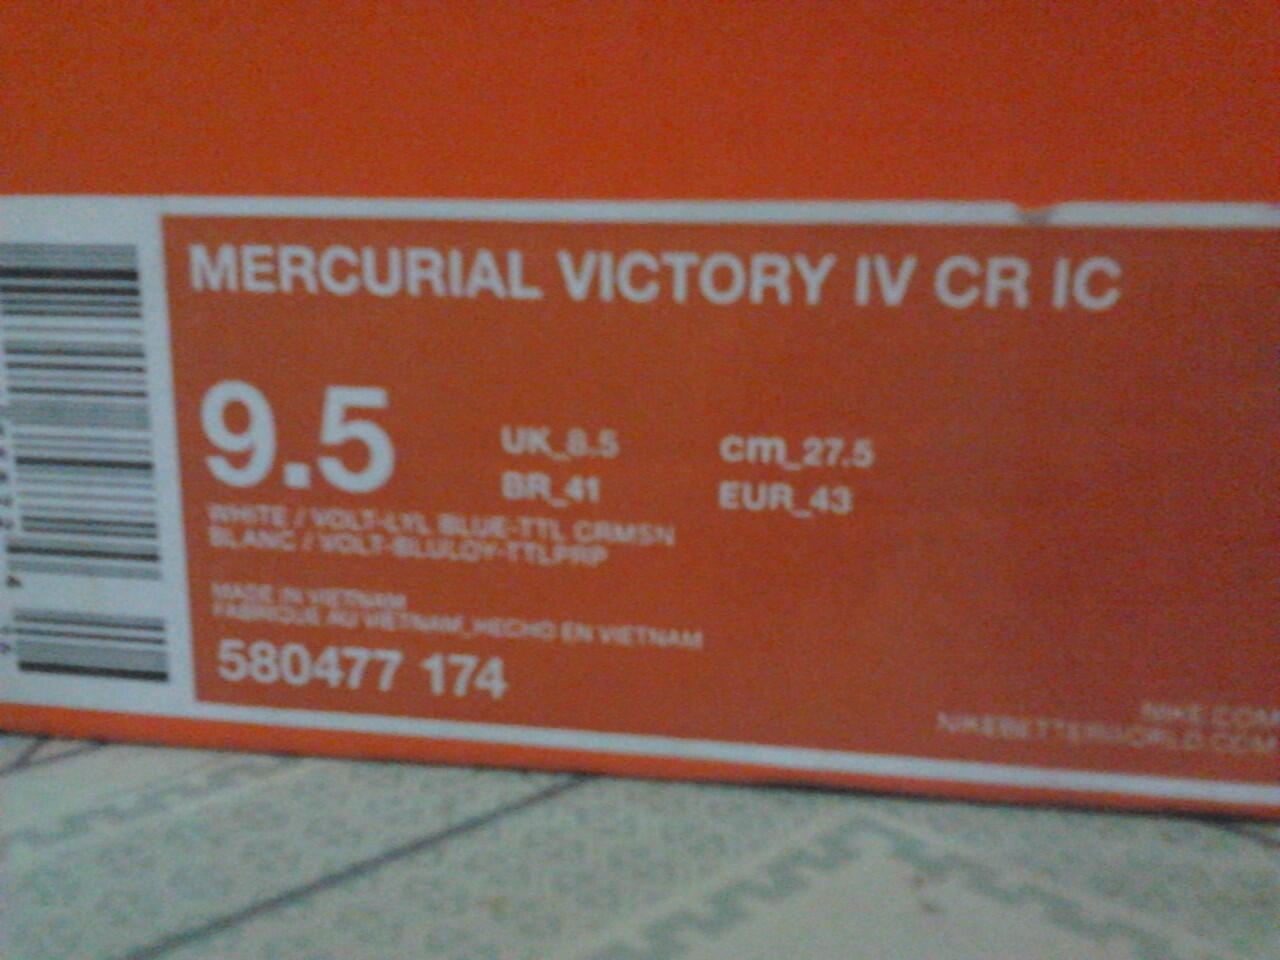 JUAL NIKE MERCURIAL IV CR IC size 43 NEGO